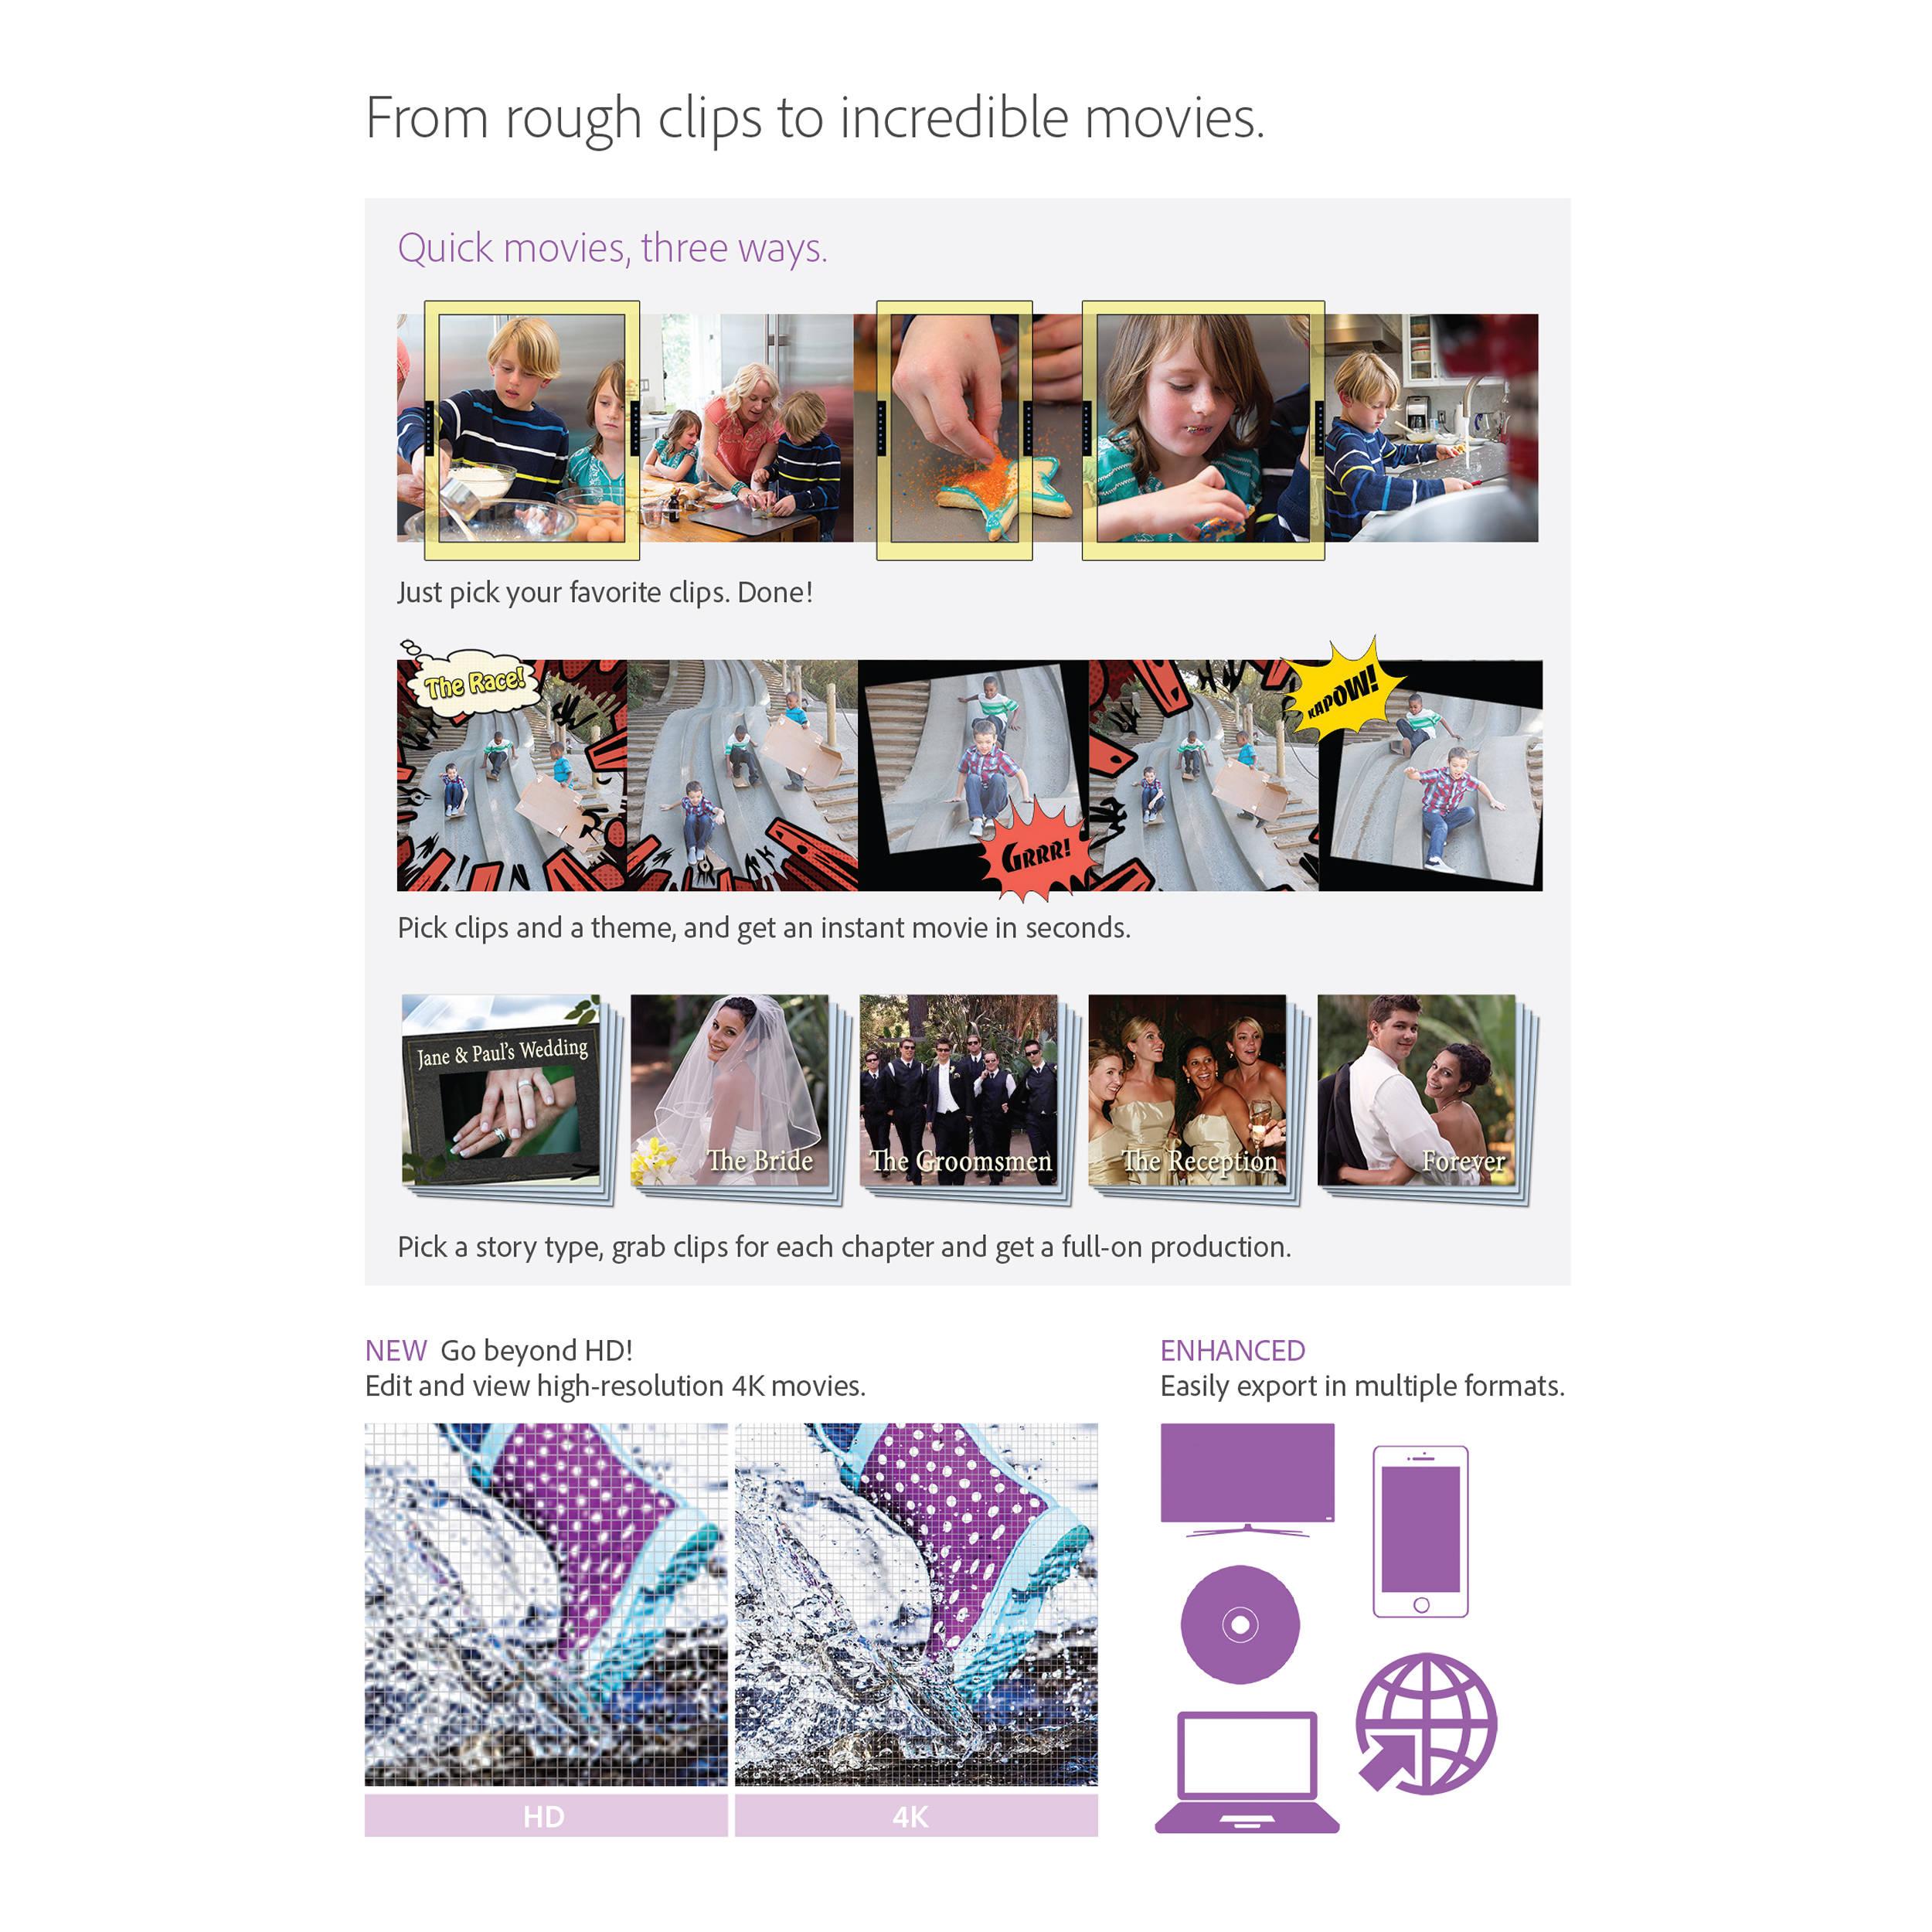 Adobe Premiere Elements 14 (Download)